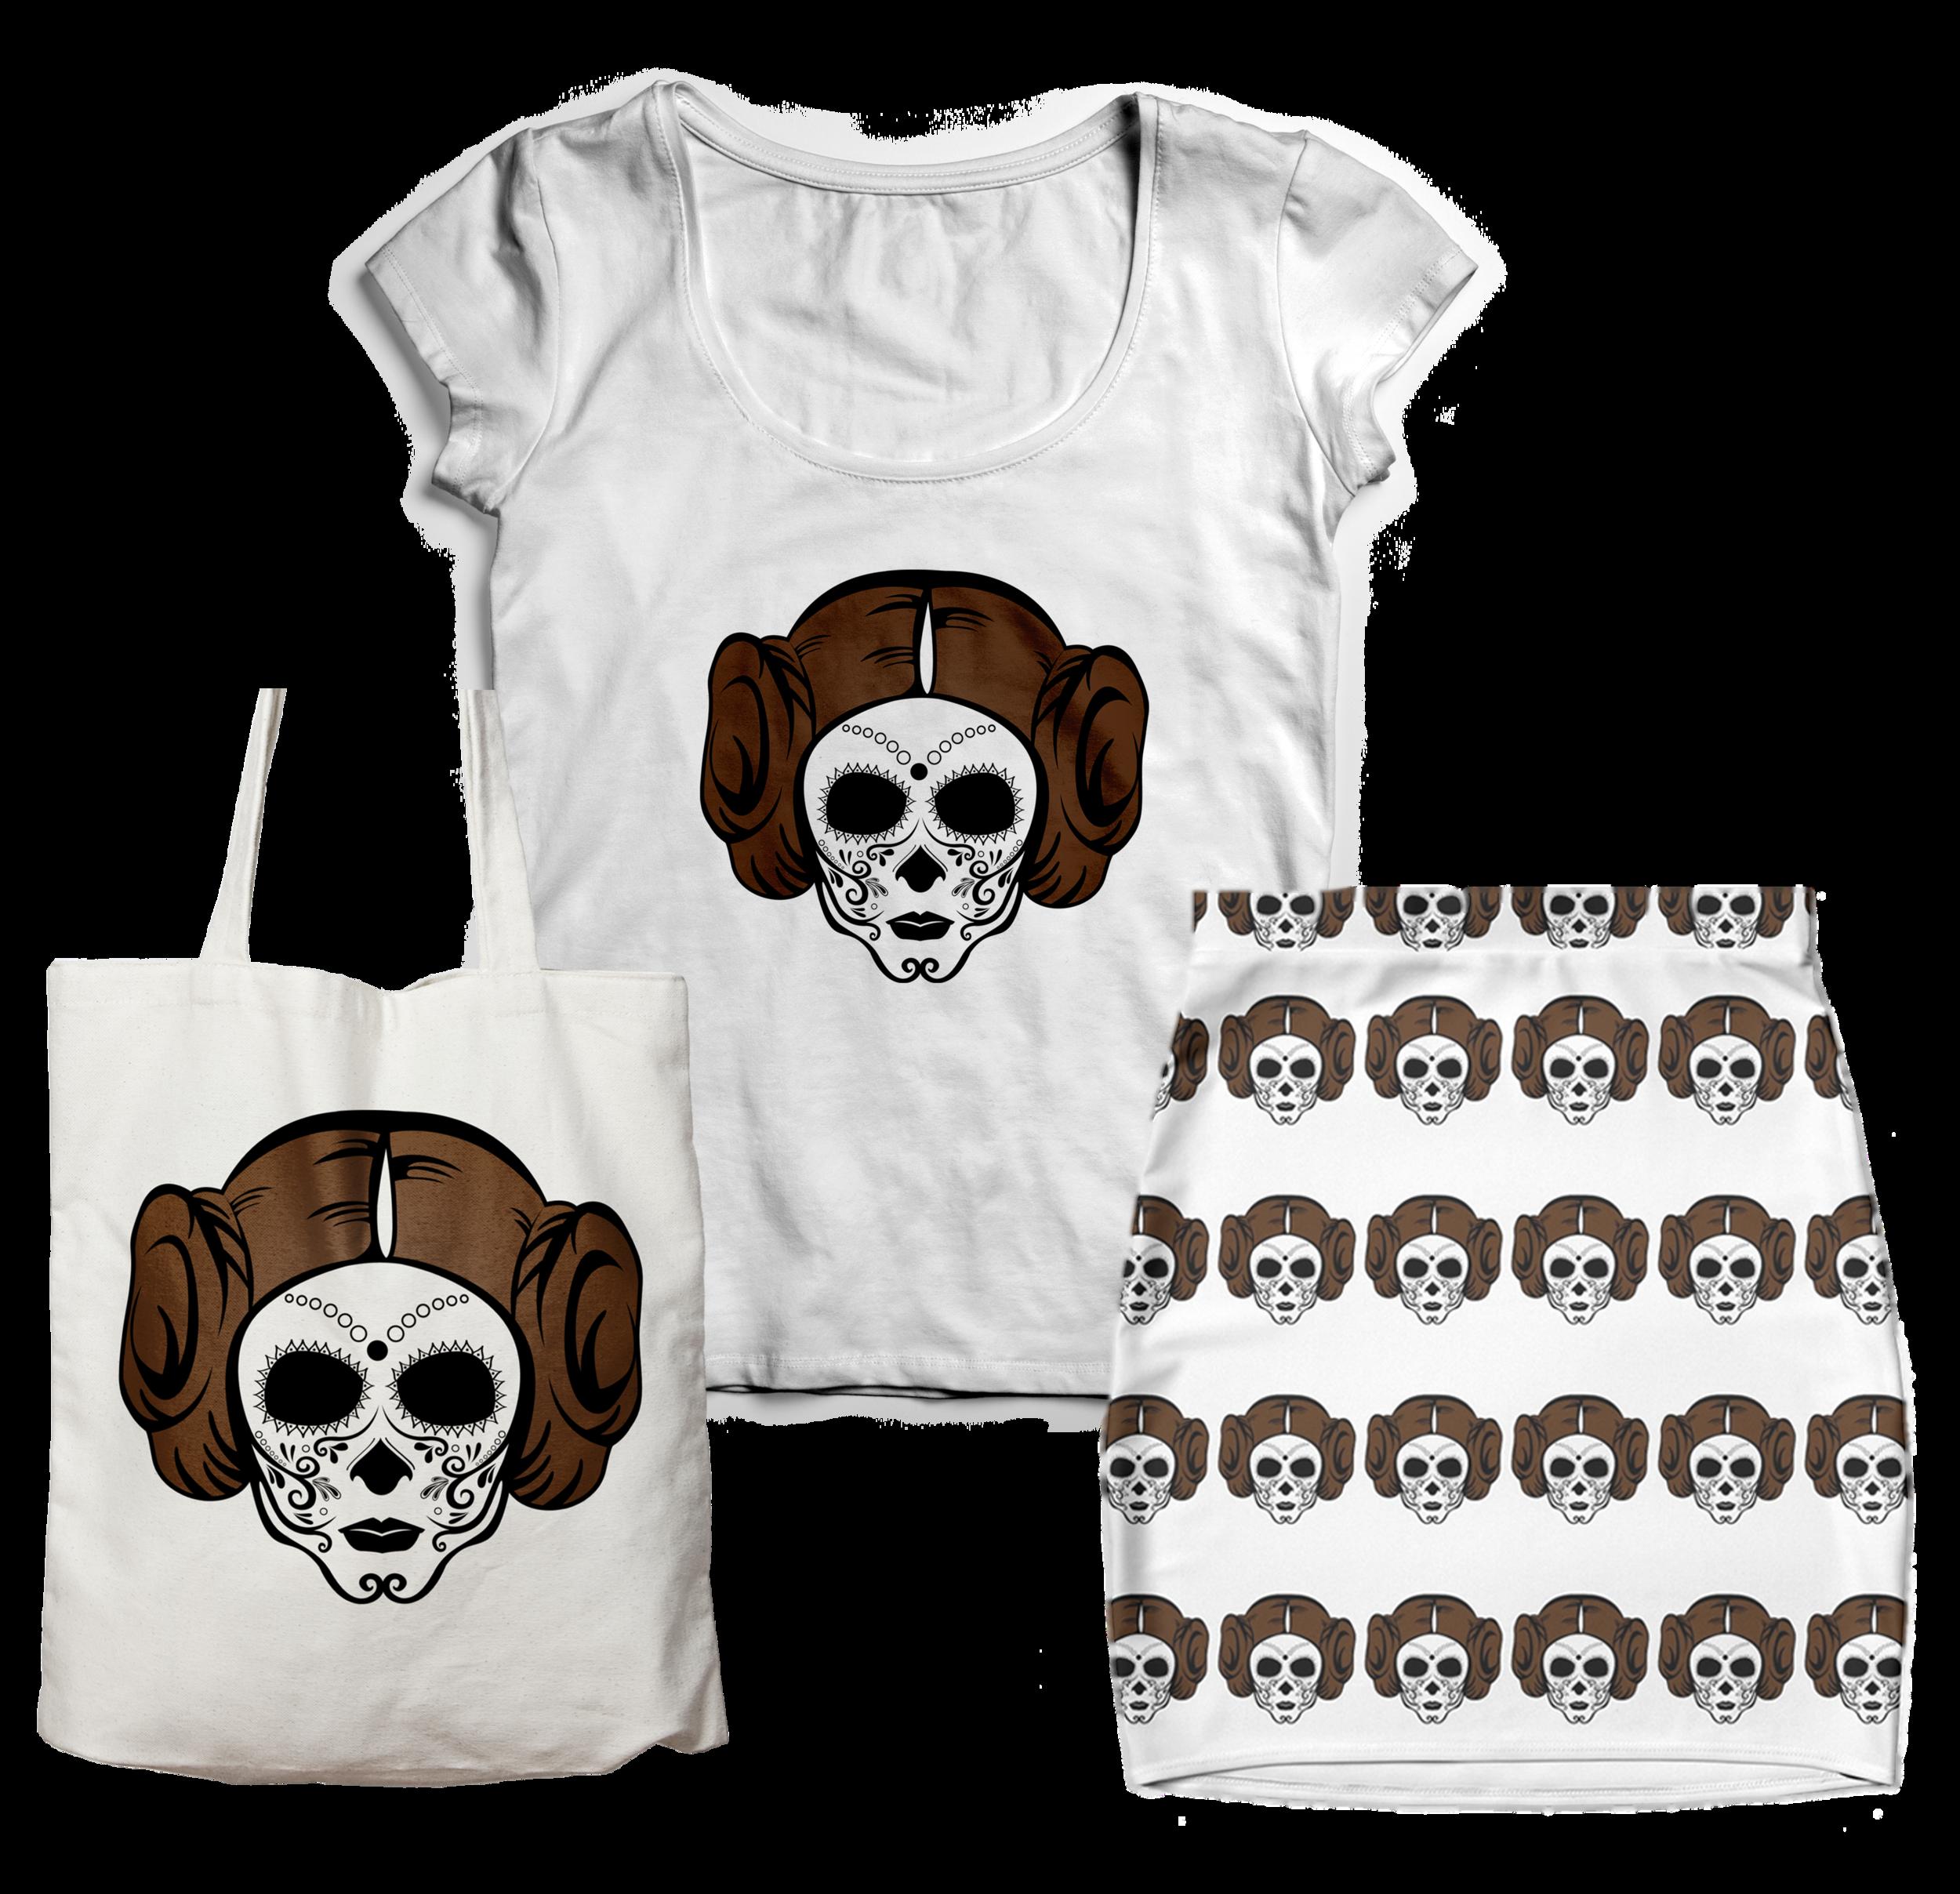 Princess Leia Sugar Skull T-shirt Tote Bag Skirt Design Jlane Design Teepublic Redbubble